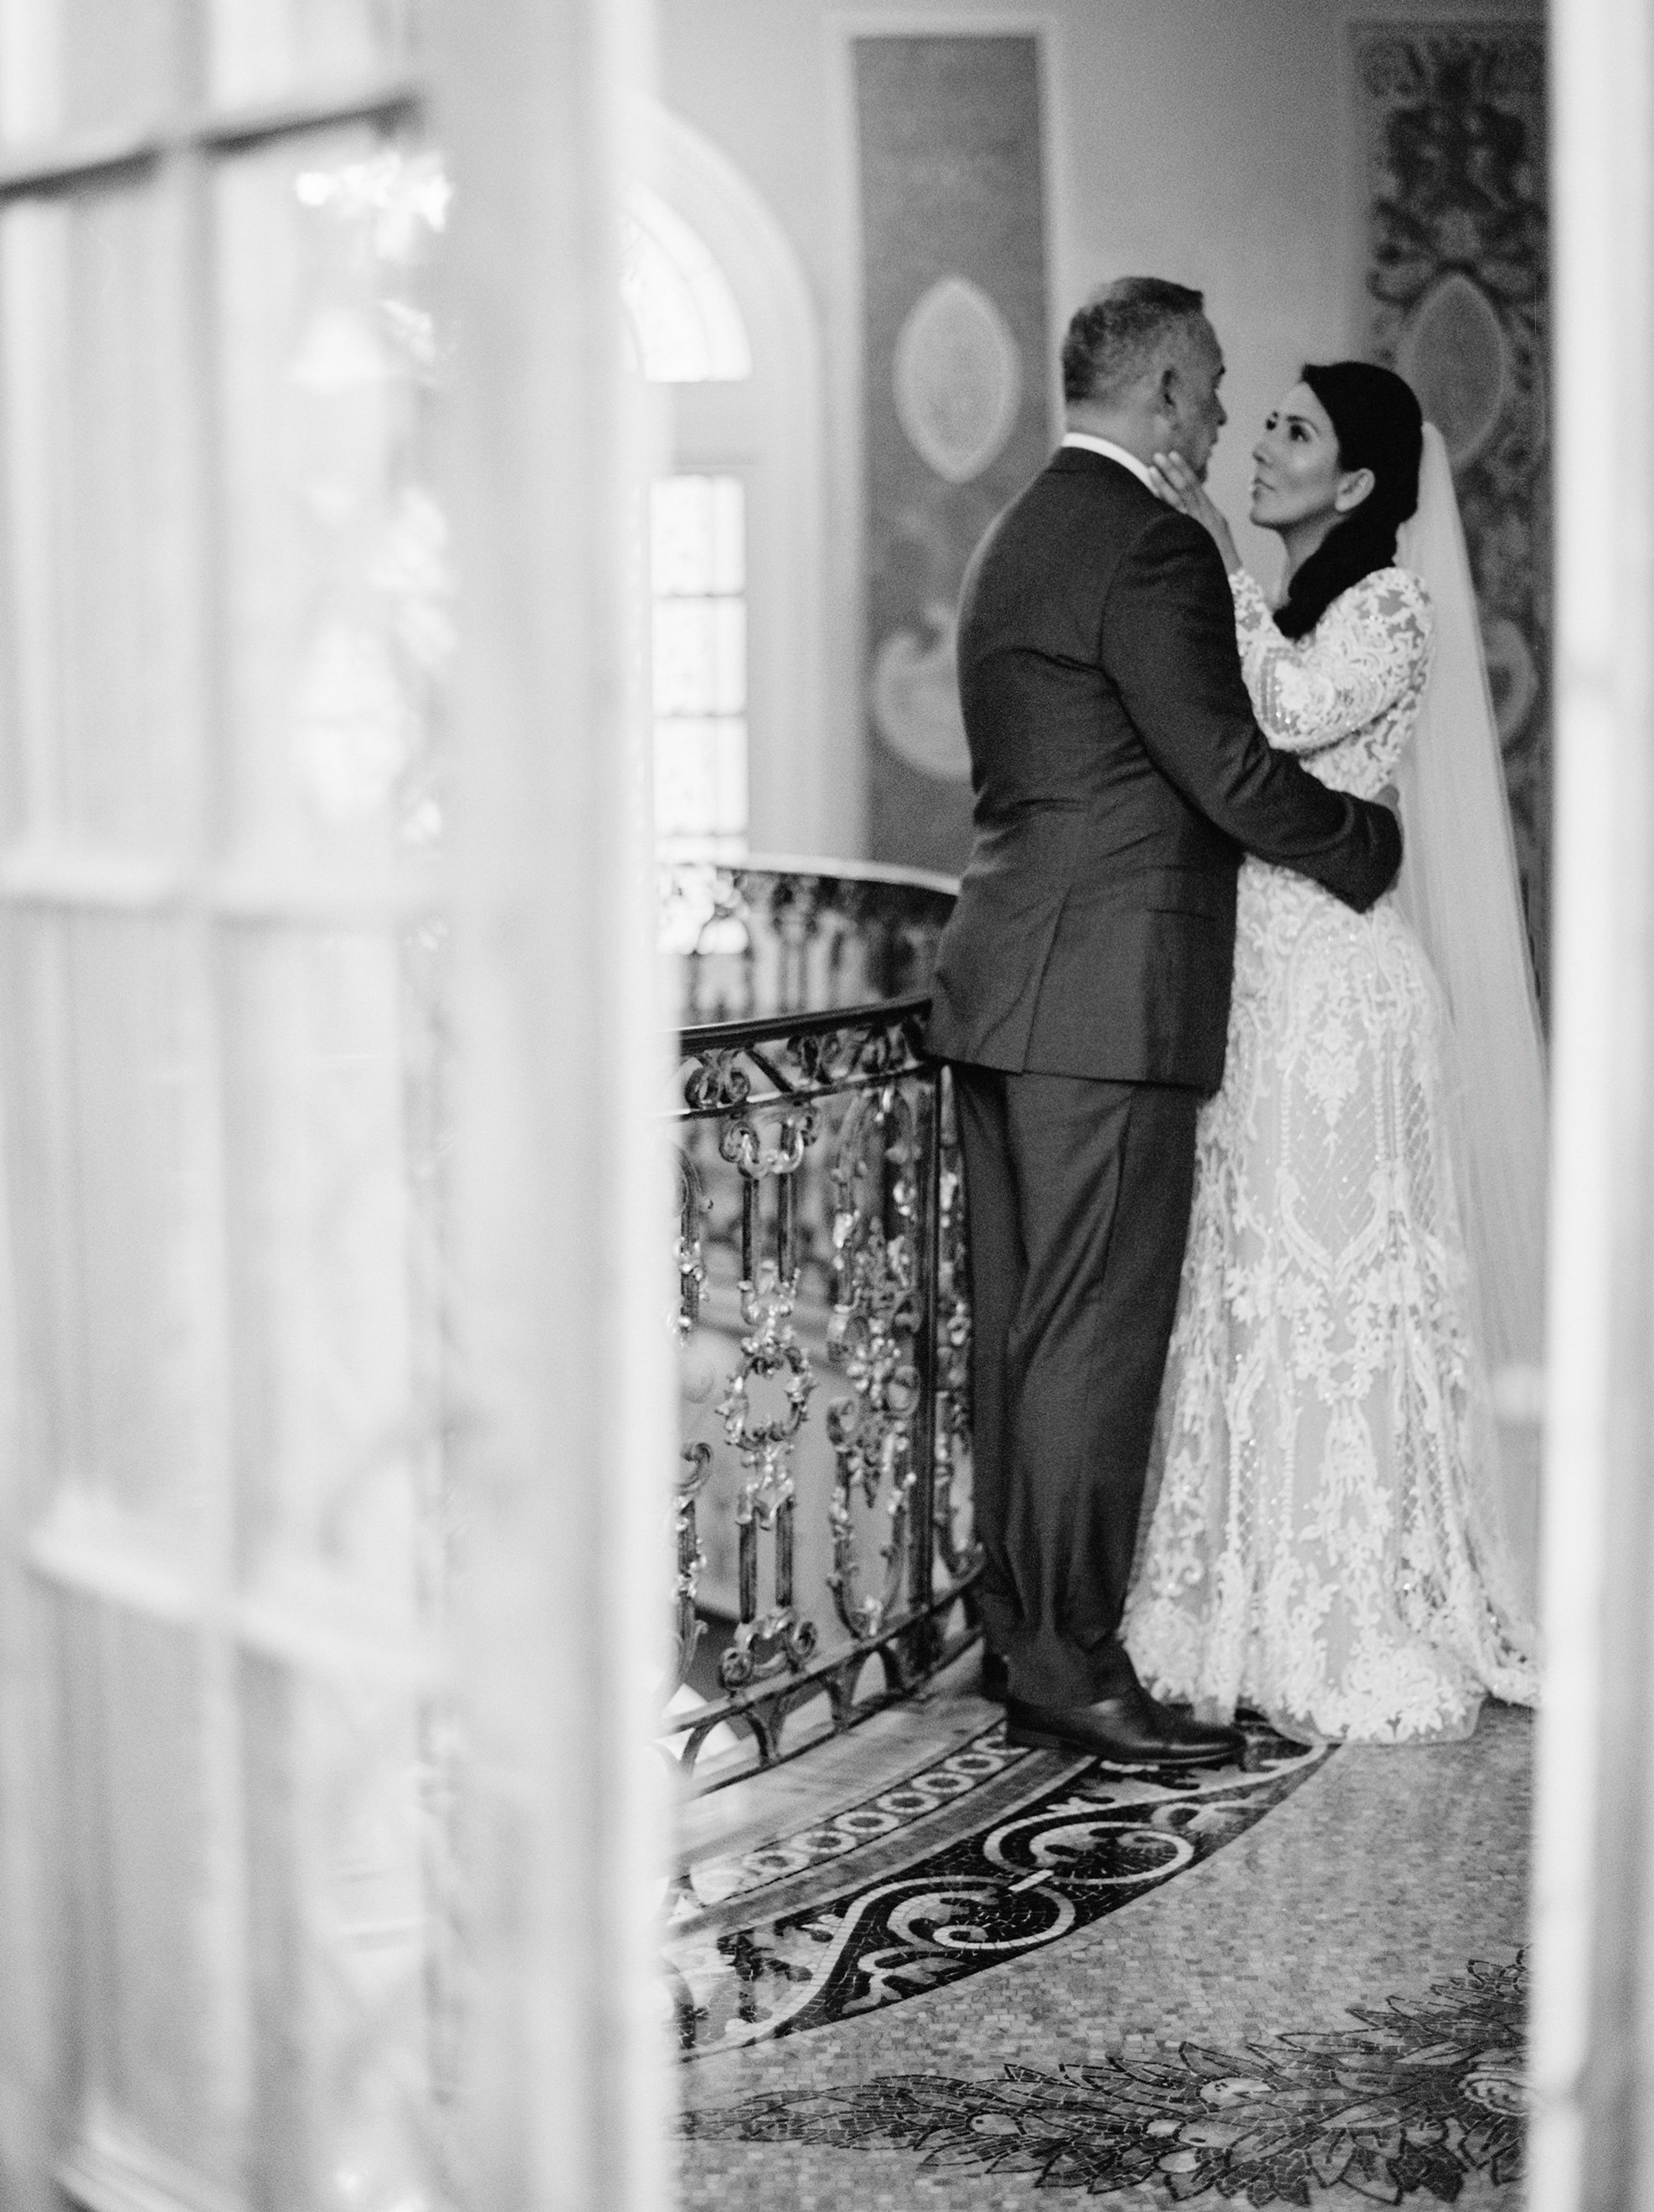 bride and groom pose inside mansion grand hallway for portrait